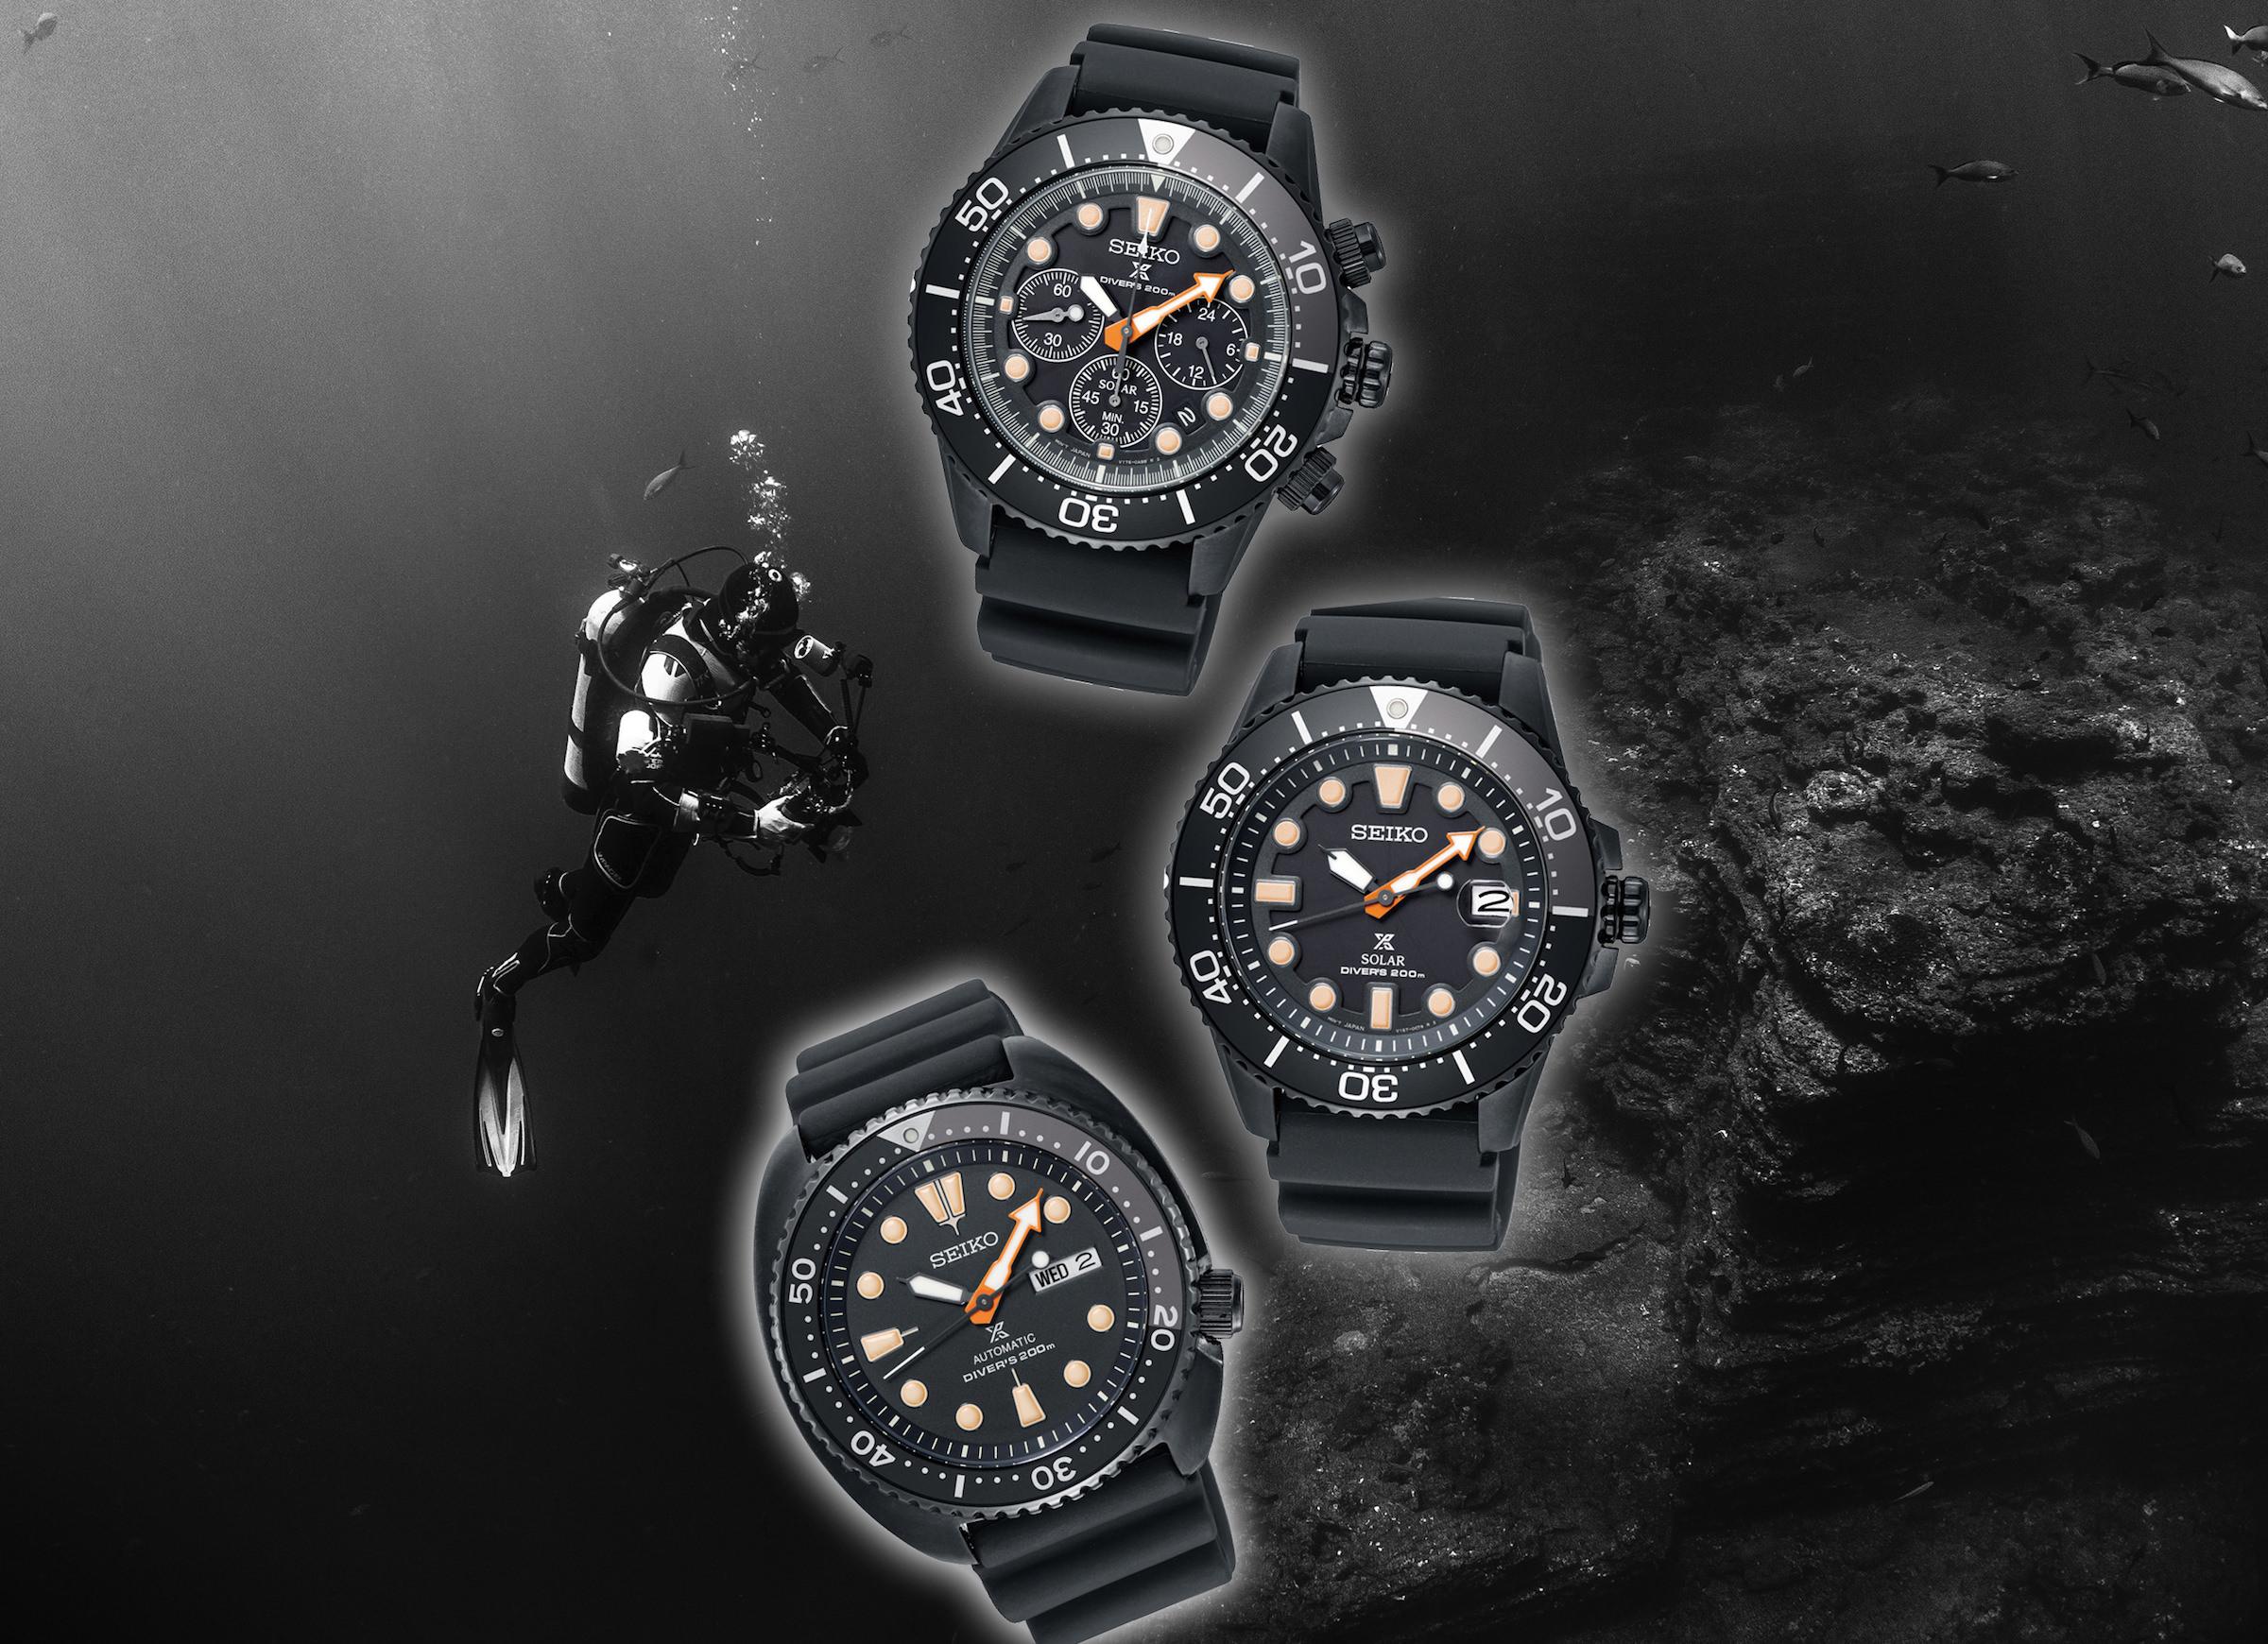 Die Seiko Prospex Black Series Diver's